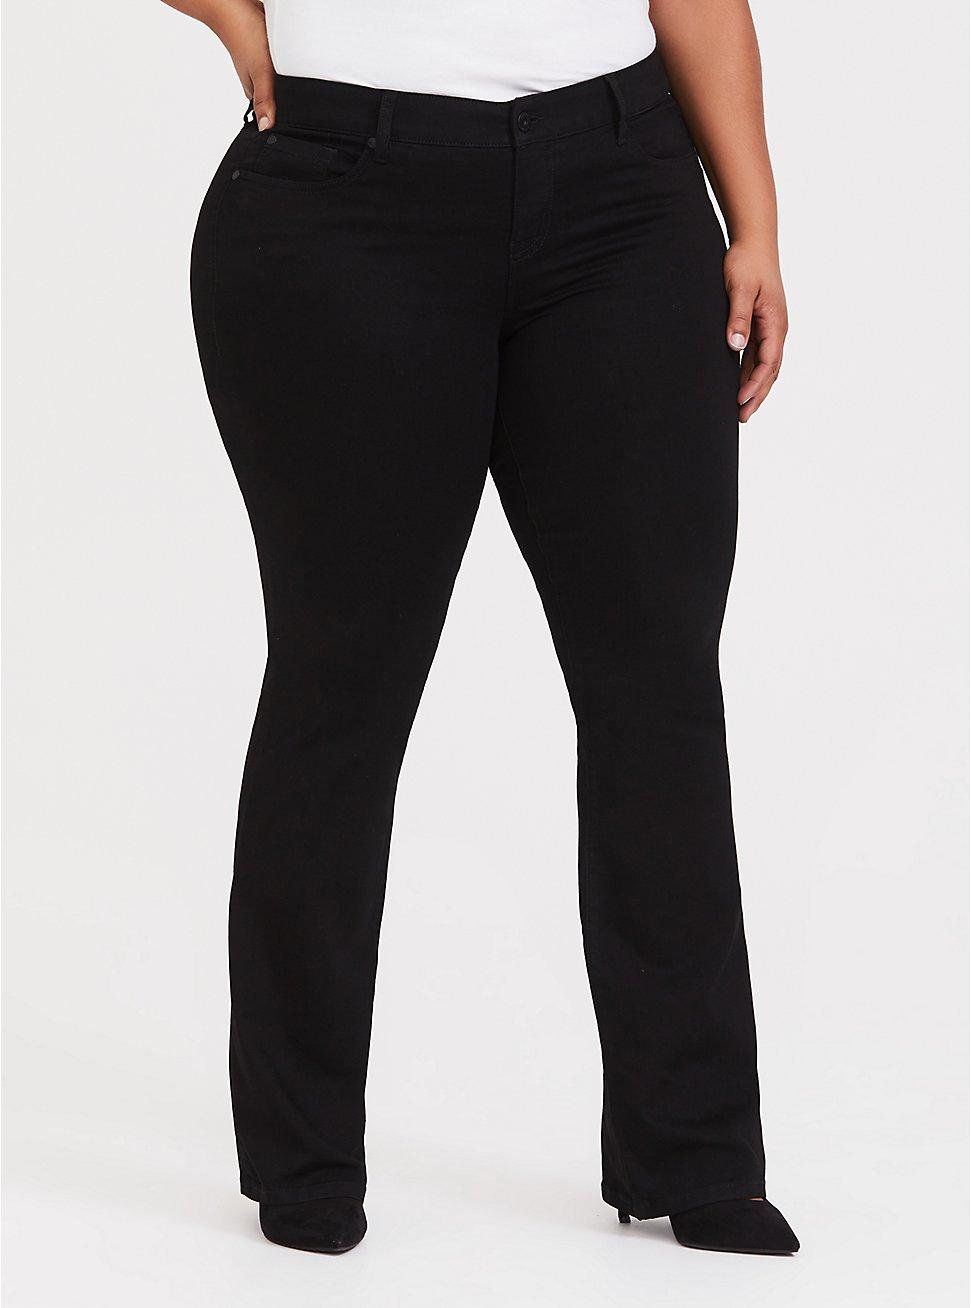 Slim Boot Jean - Vintage Stretch Black, BLACK, hi-res